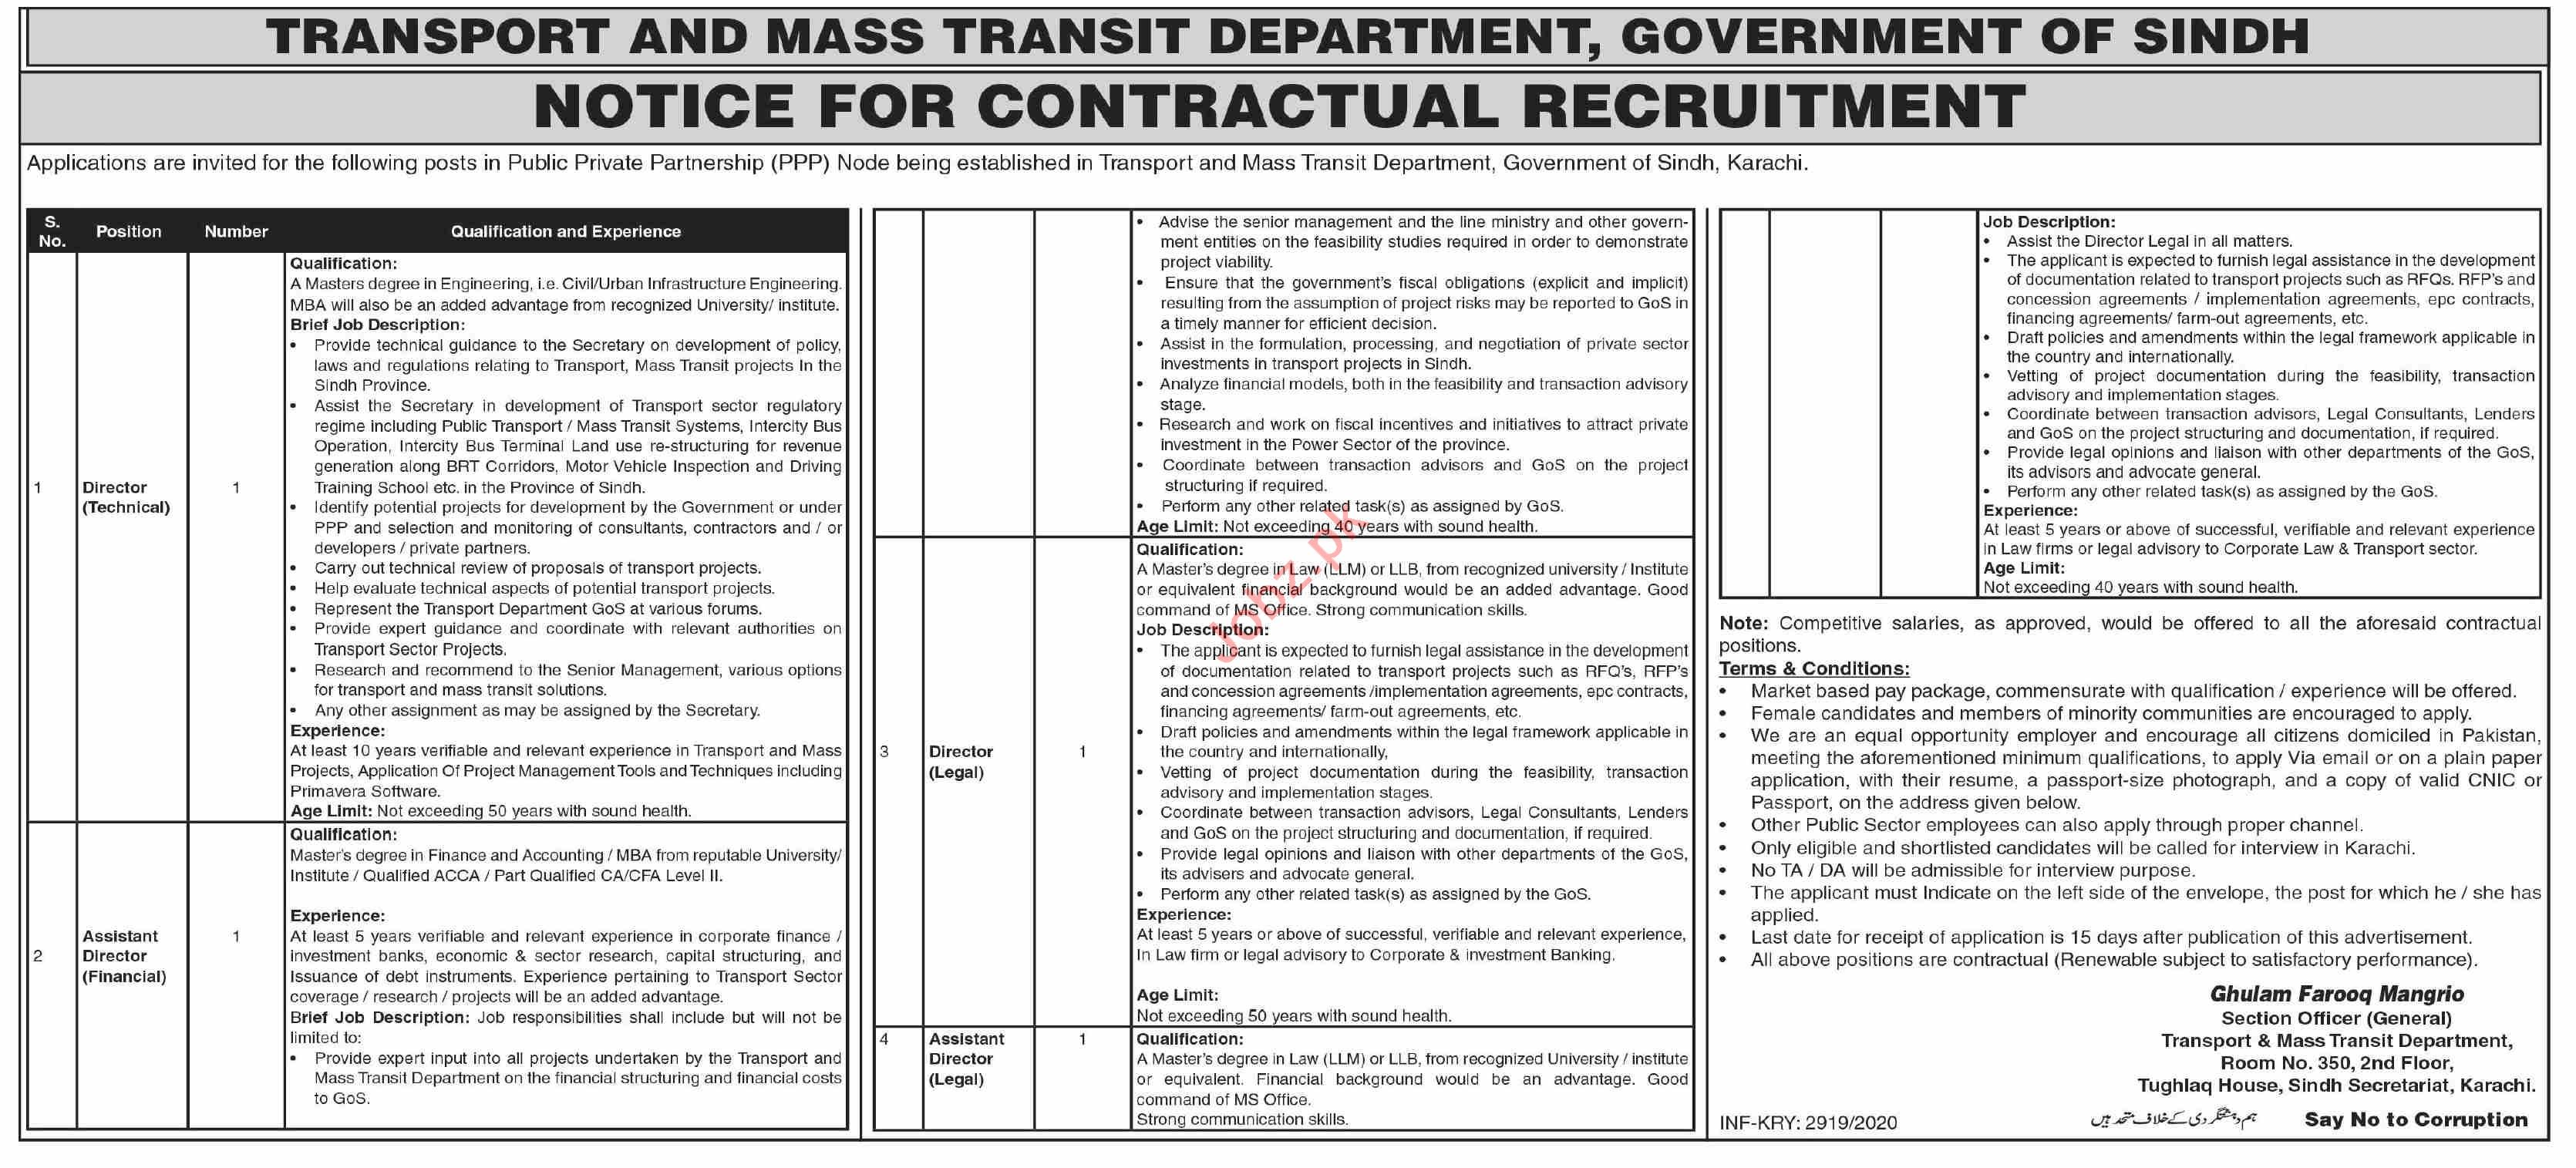 Transport & Mass Transit Department Sindh Jobs 2020